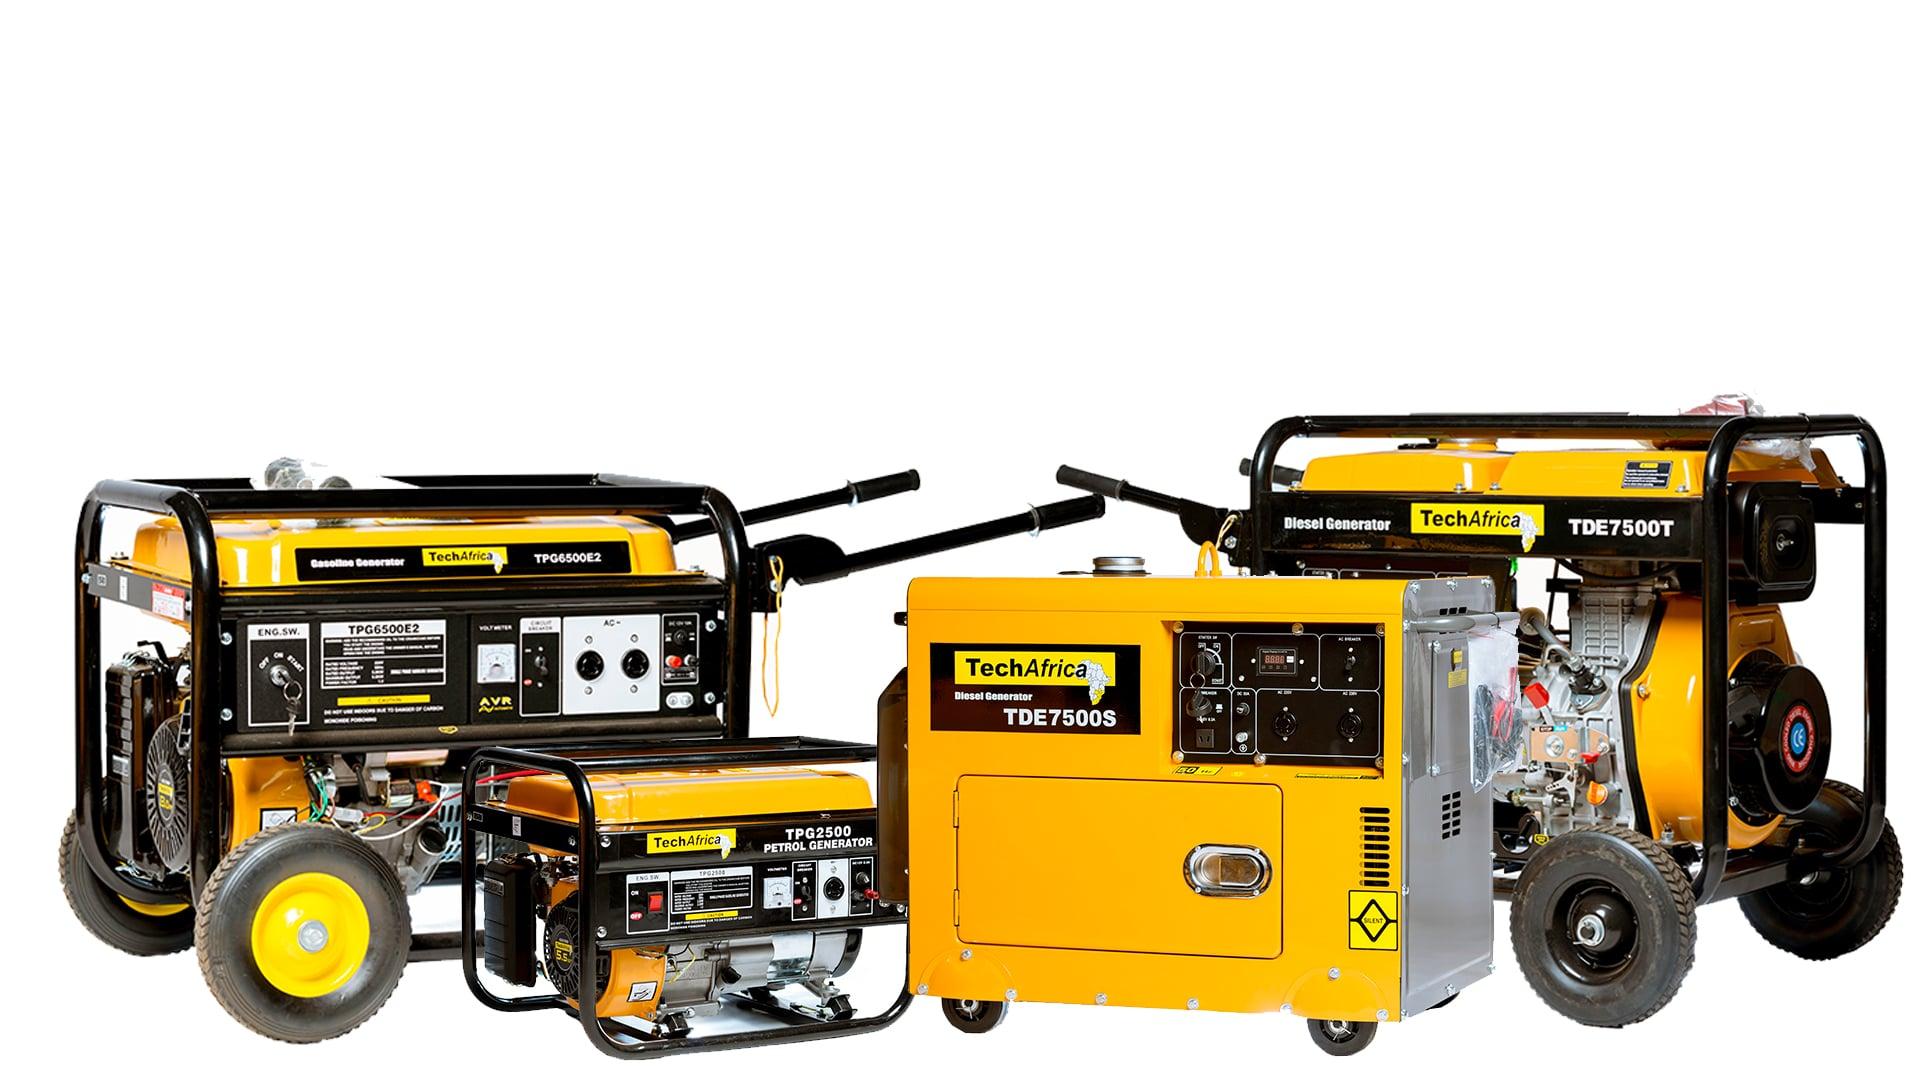 diesel and petrol generators for sale in Harare, Zimbabwe